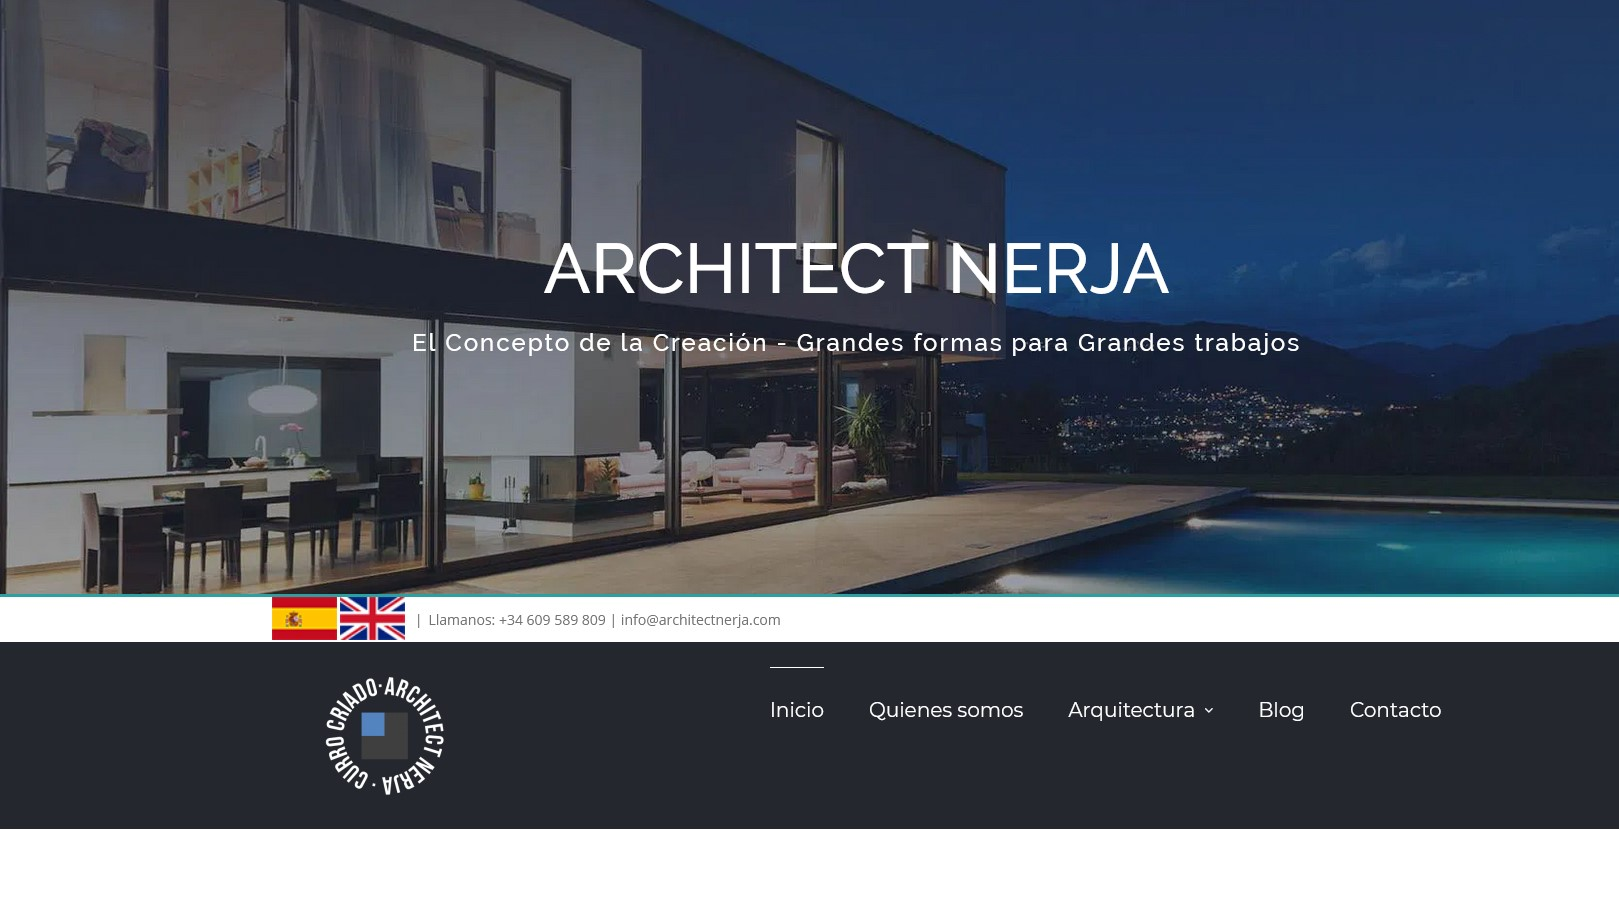 Architect Nerja web